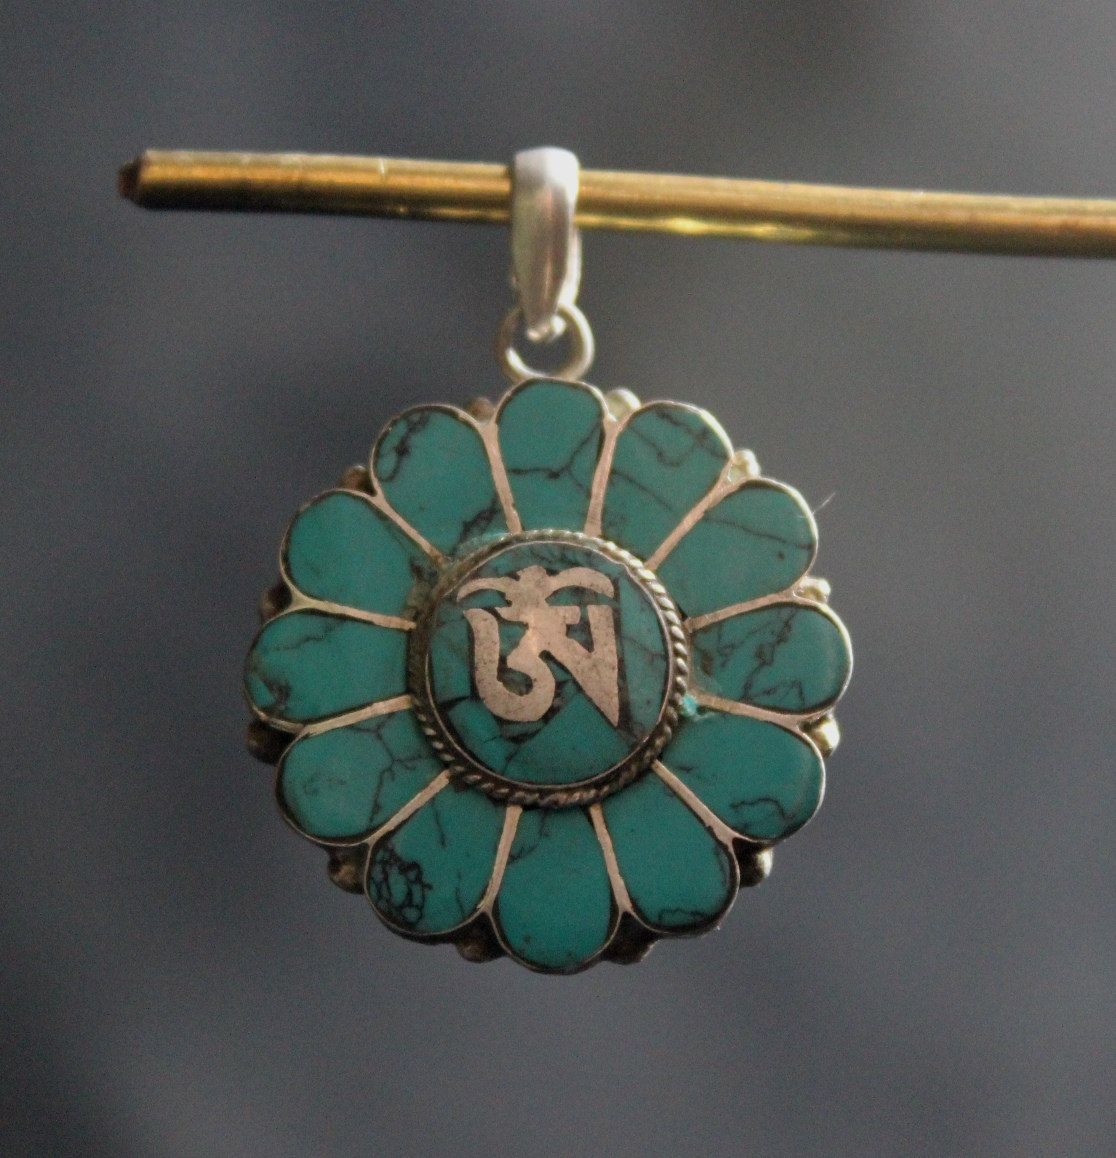 925 Sterling Silver Turquoise Flower Designer Pendant Handmade in Nepal by ShakyaHandicraft on Etsy